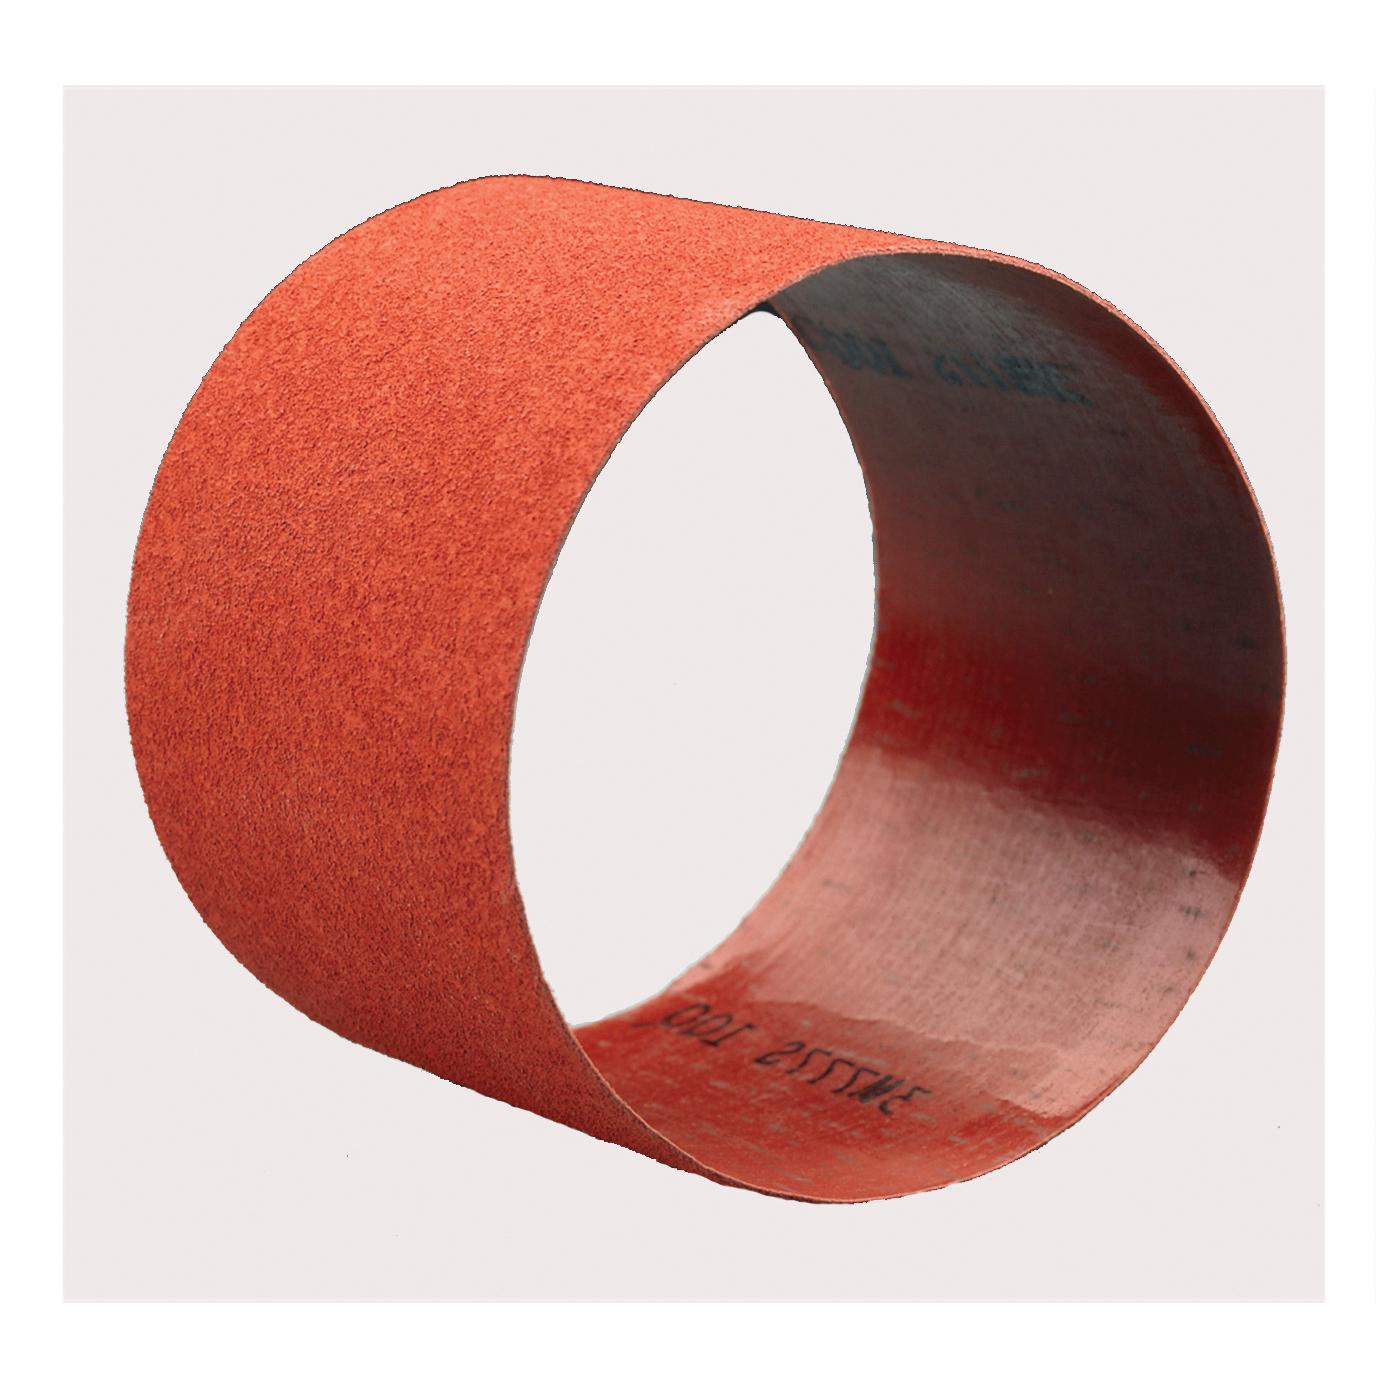 3M™ 051144-85821 L-Flex Portable Coated Abrasive Belt, 3 in W x 10-11/16 in L, P120 Grit, Fine Grade, Ceramic Aluminum Oxide Abrasive, Polyester Backing